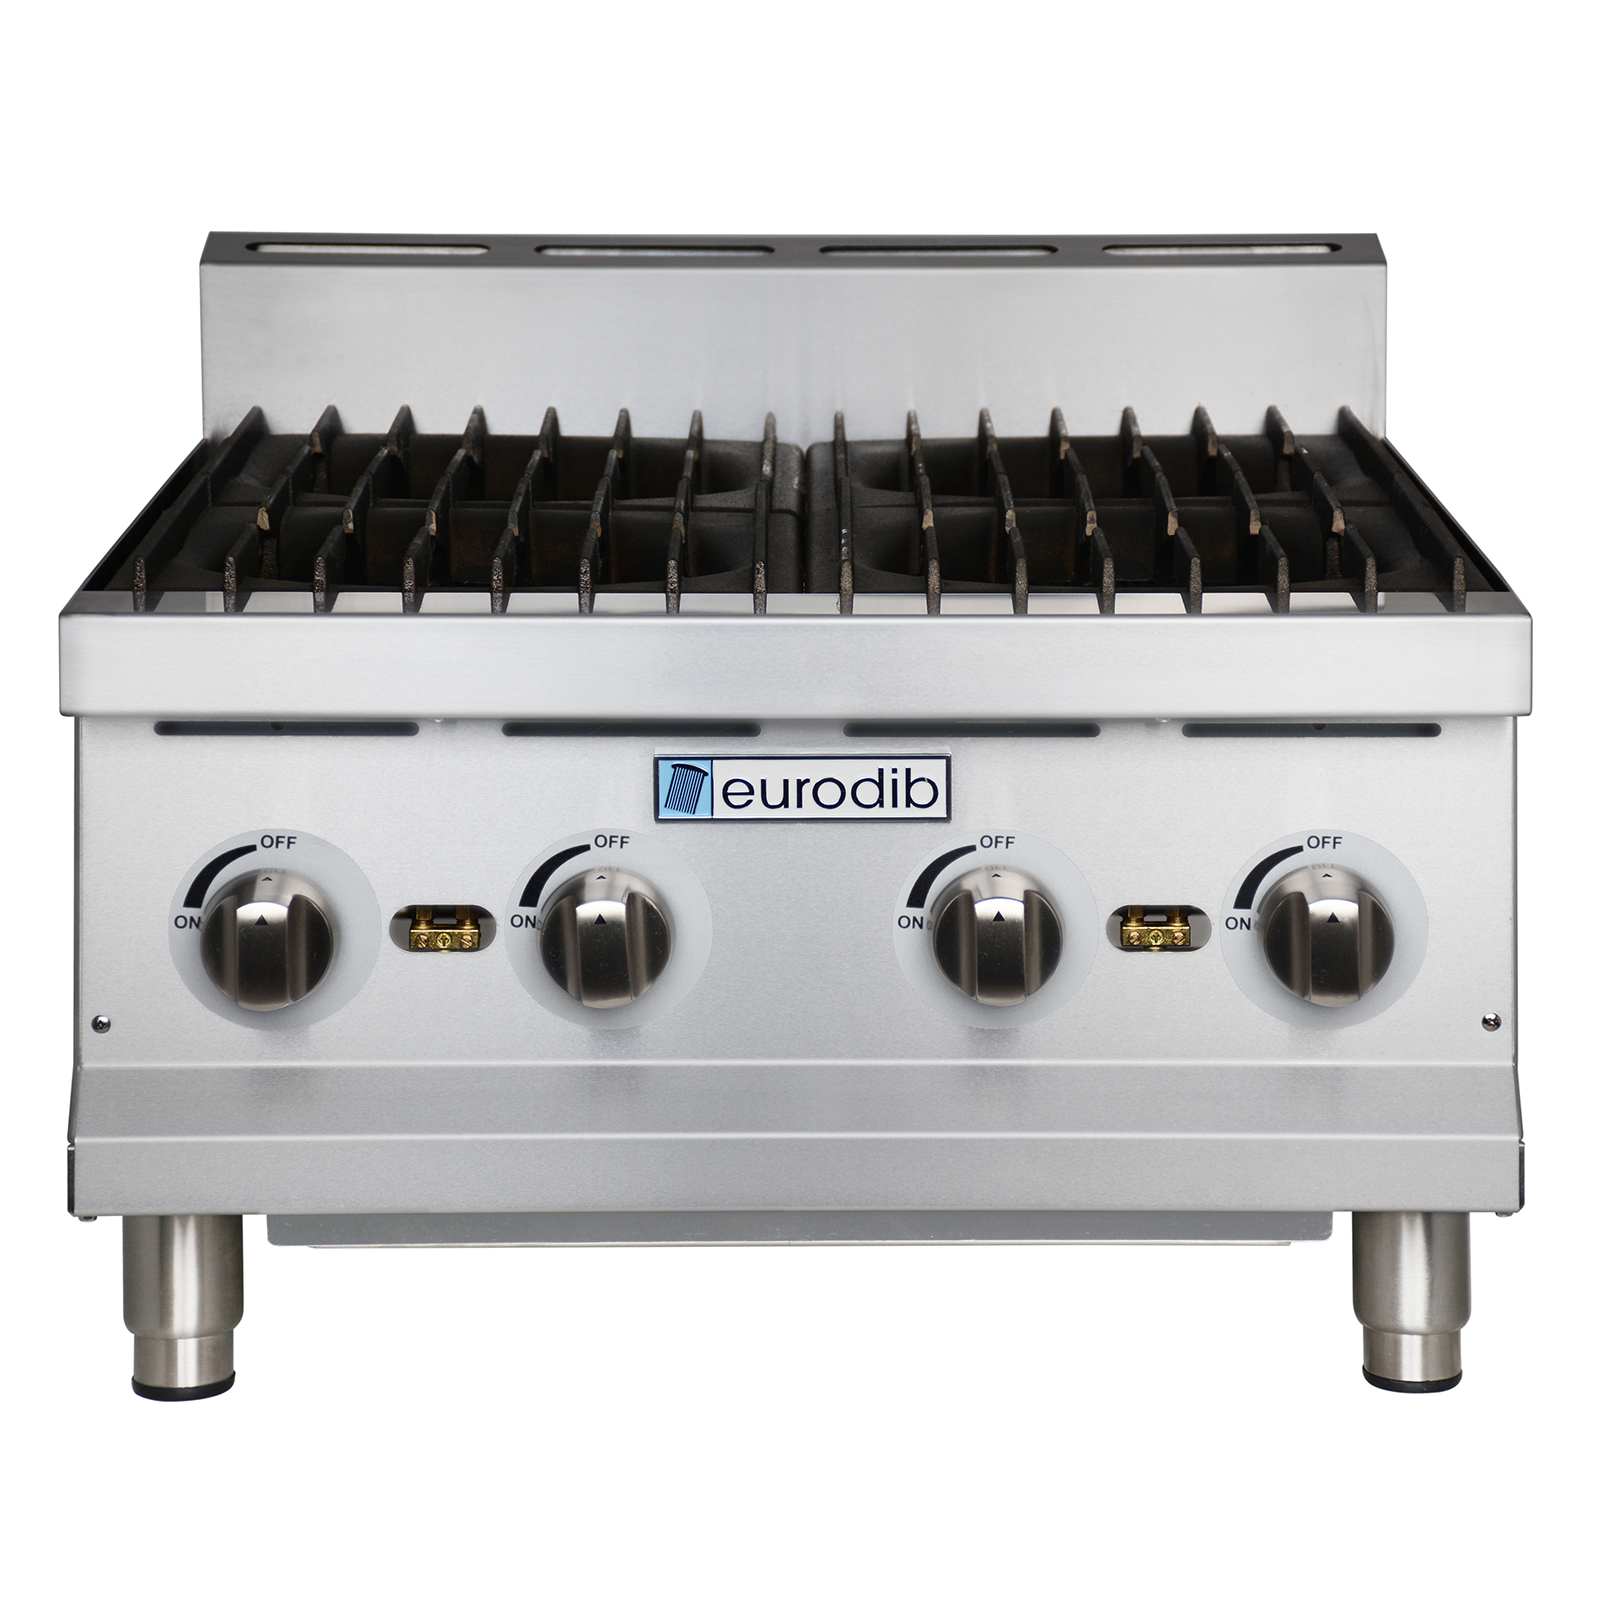 Eurodib USA T-HP424 hotplate, countertop, gas